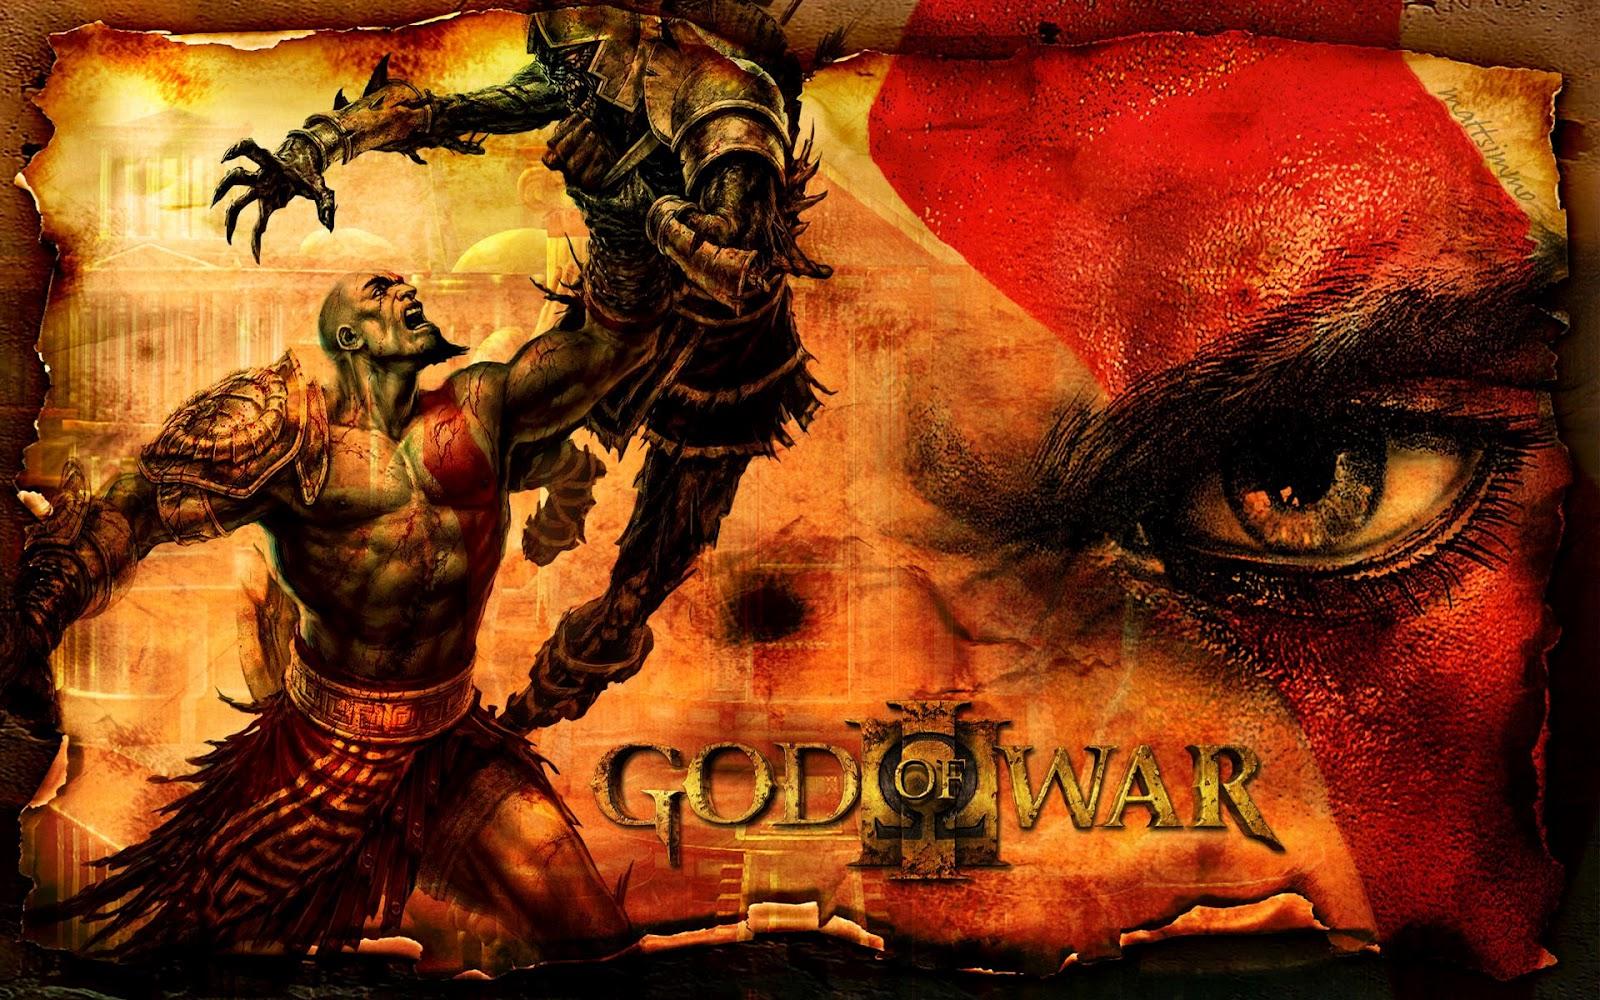 Killzone Shadow Fall Wallpapers Hd Wallpapers Hd God Of War 44 Wallpapers Fondo De